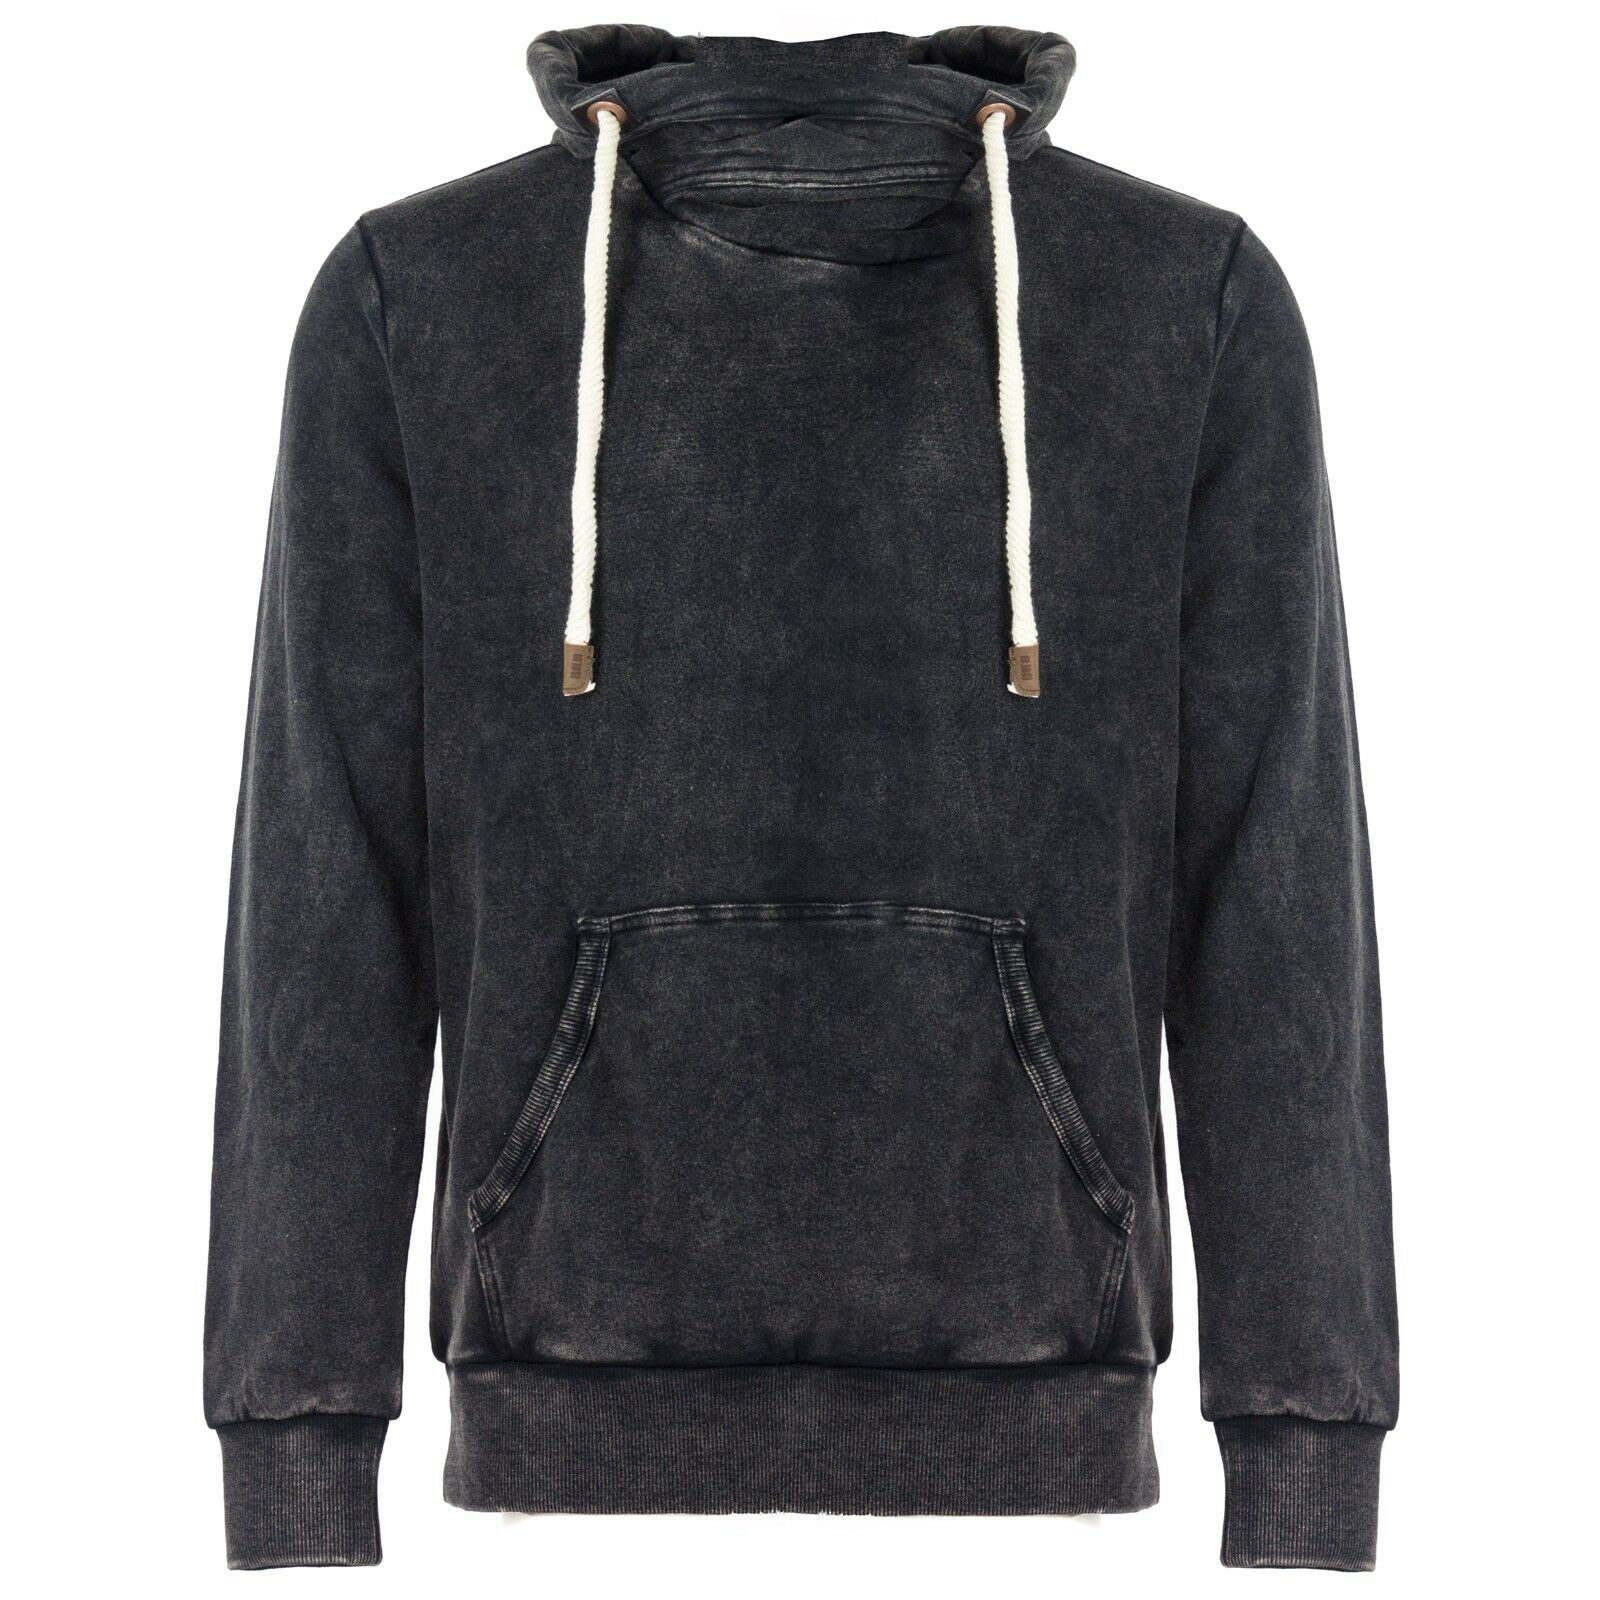 Solid Herren Sweatshirt Pullover Pulli Sweat Kapuze Vintage Look Kapuzenpulli